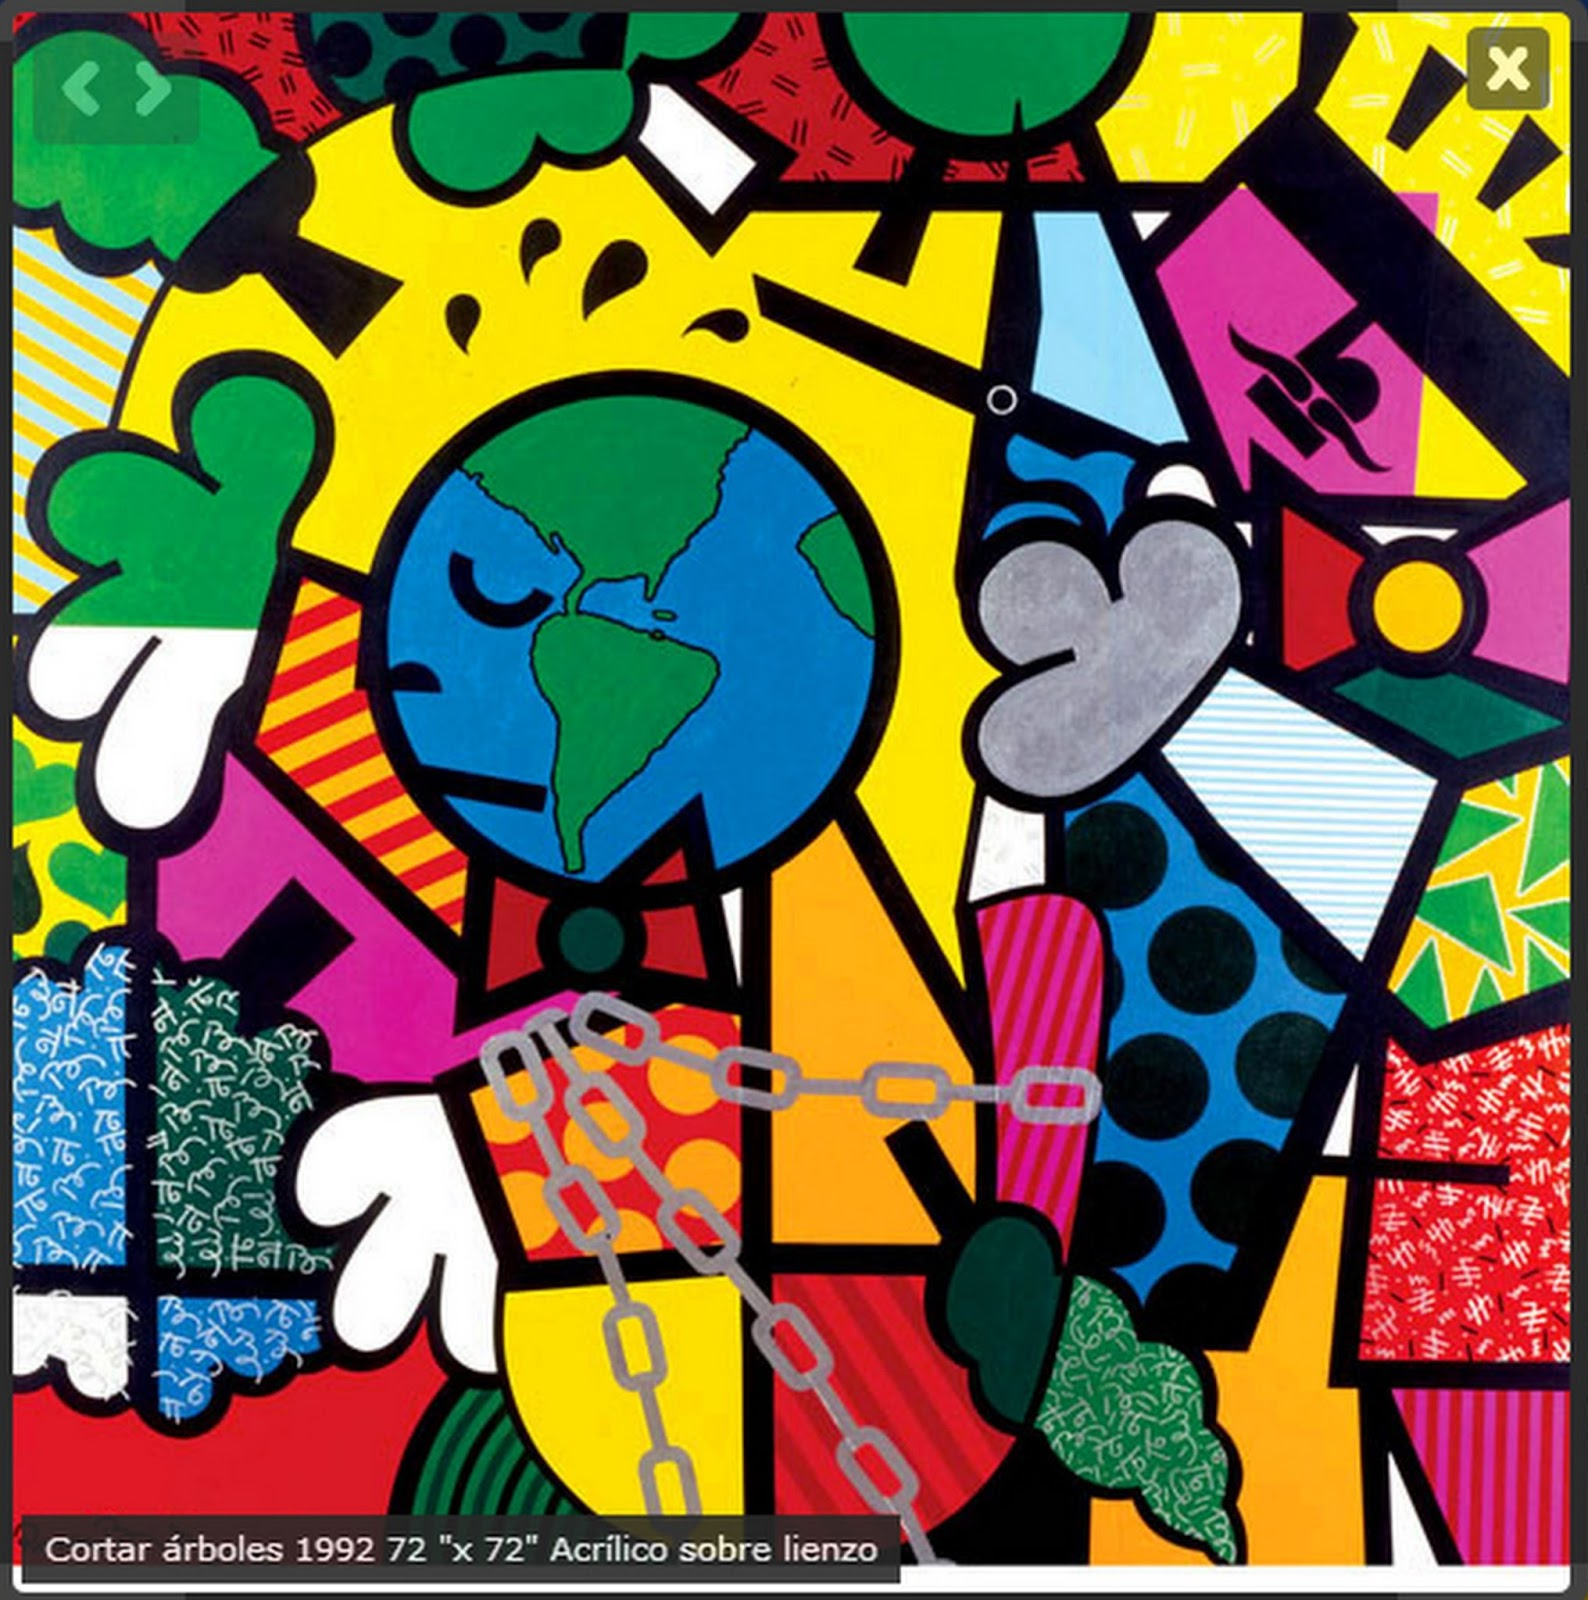 Pinturas cuadros lienzos imagenes arte de brito for Cuadros coloridos modernos